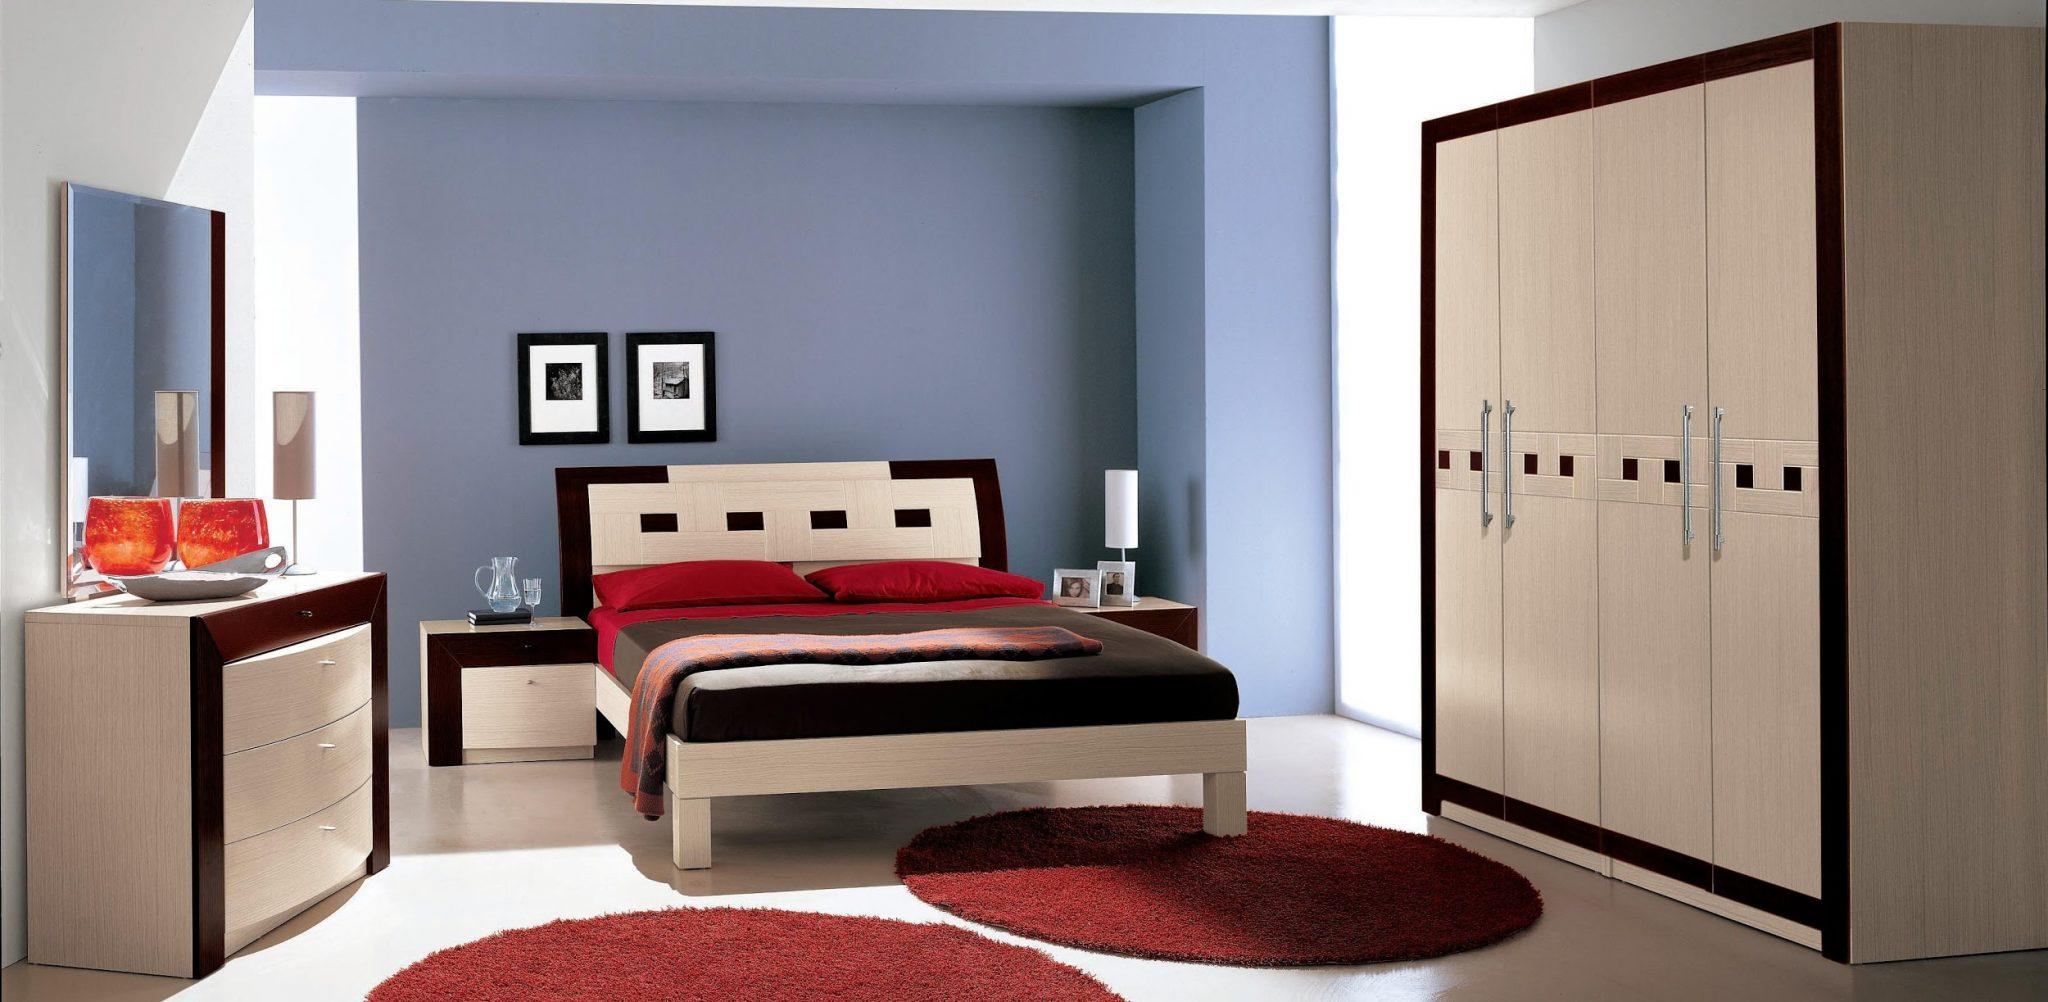 Teenage Girl Bedroom Color Schemes Ideas